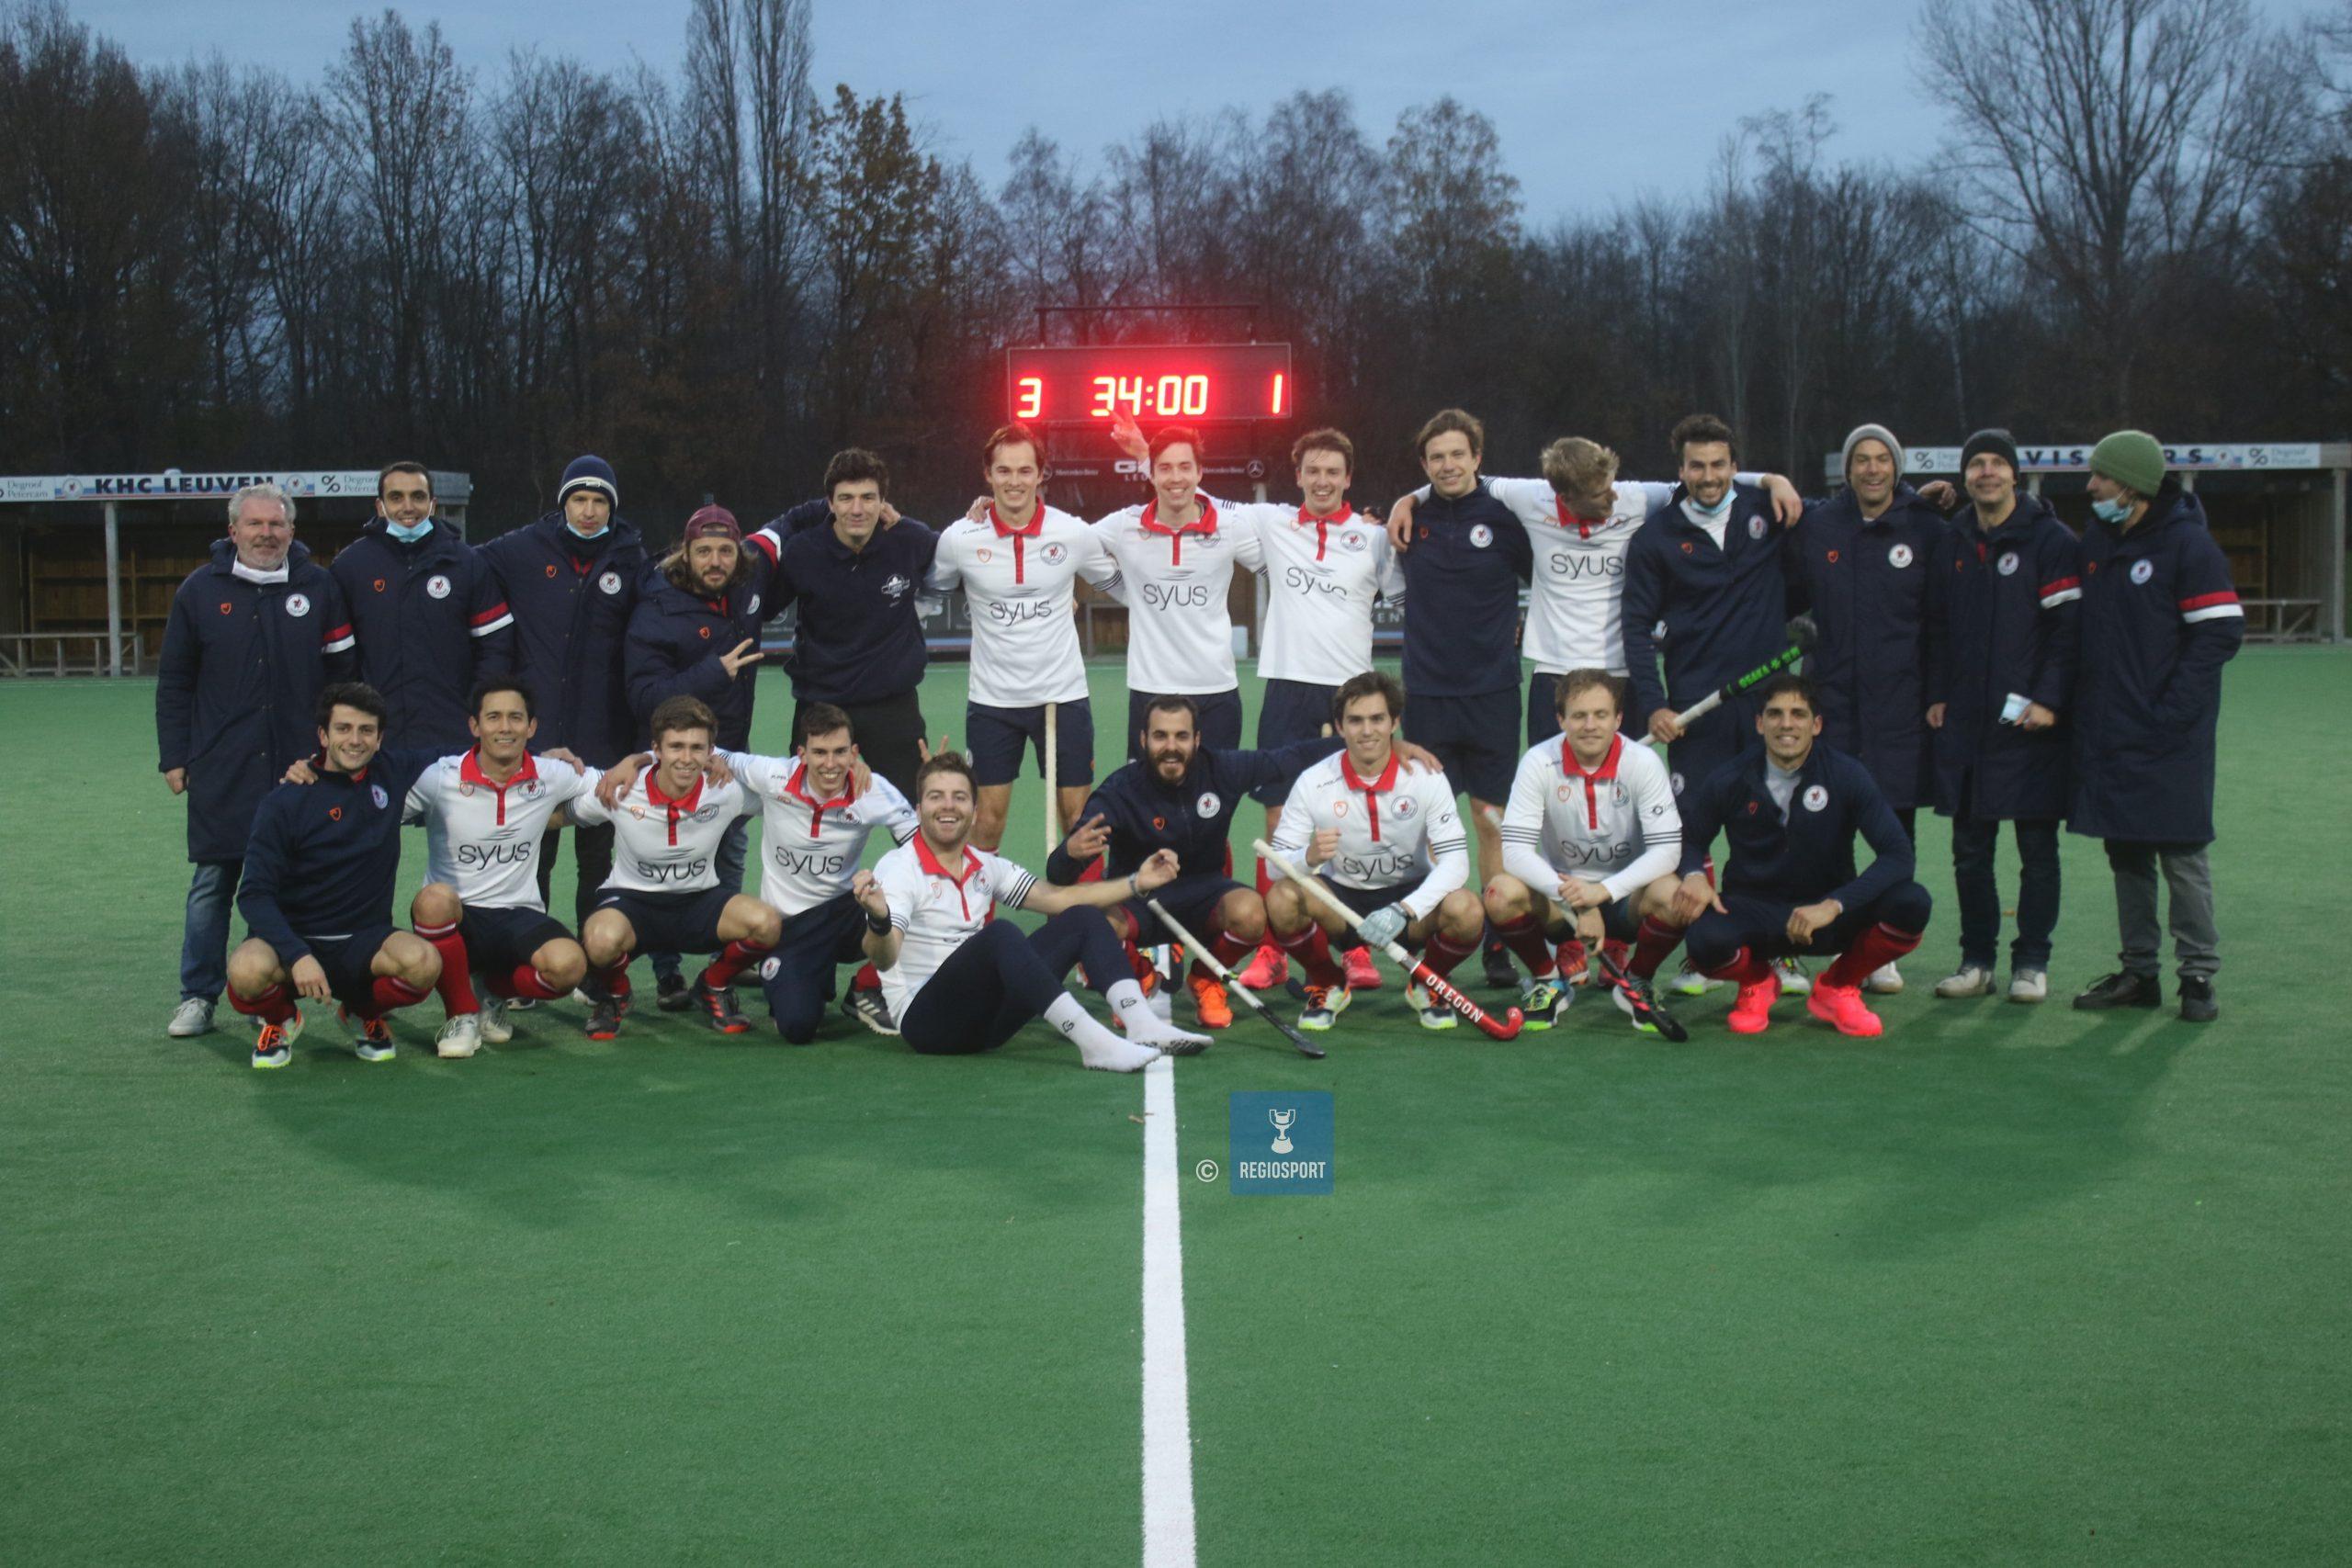 KHC Leuven klopt Antwerp na donderpreek van coach Trenchs